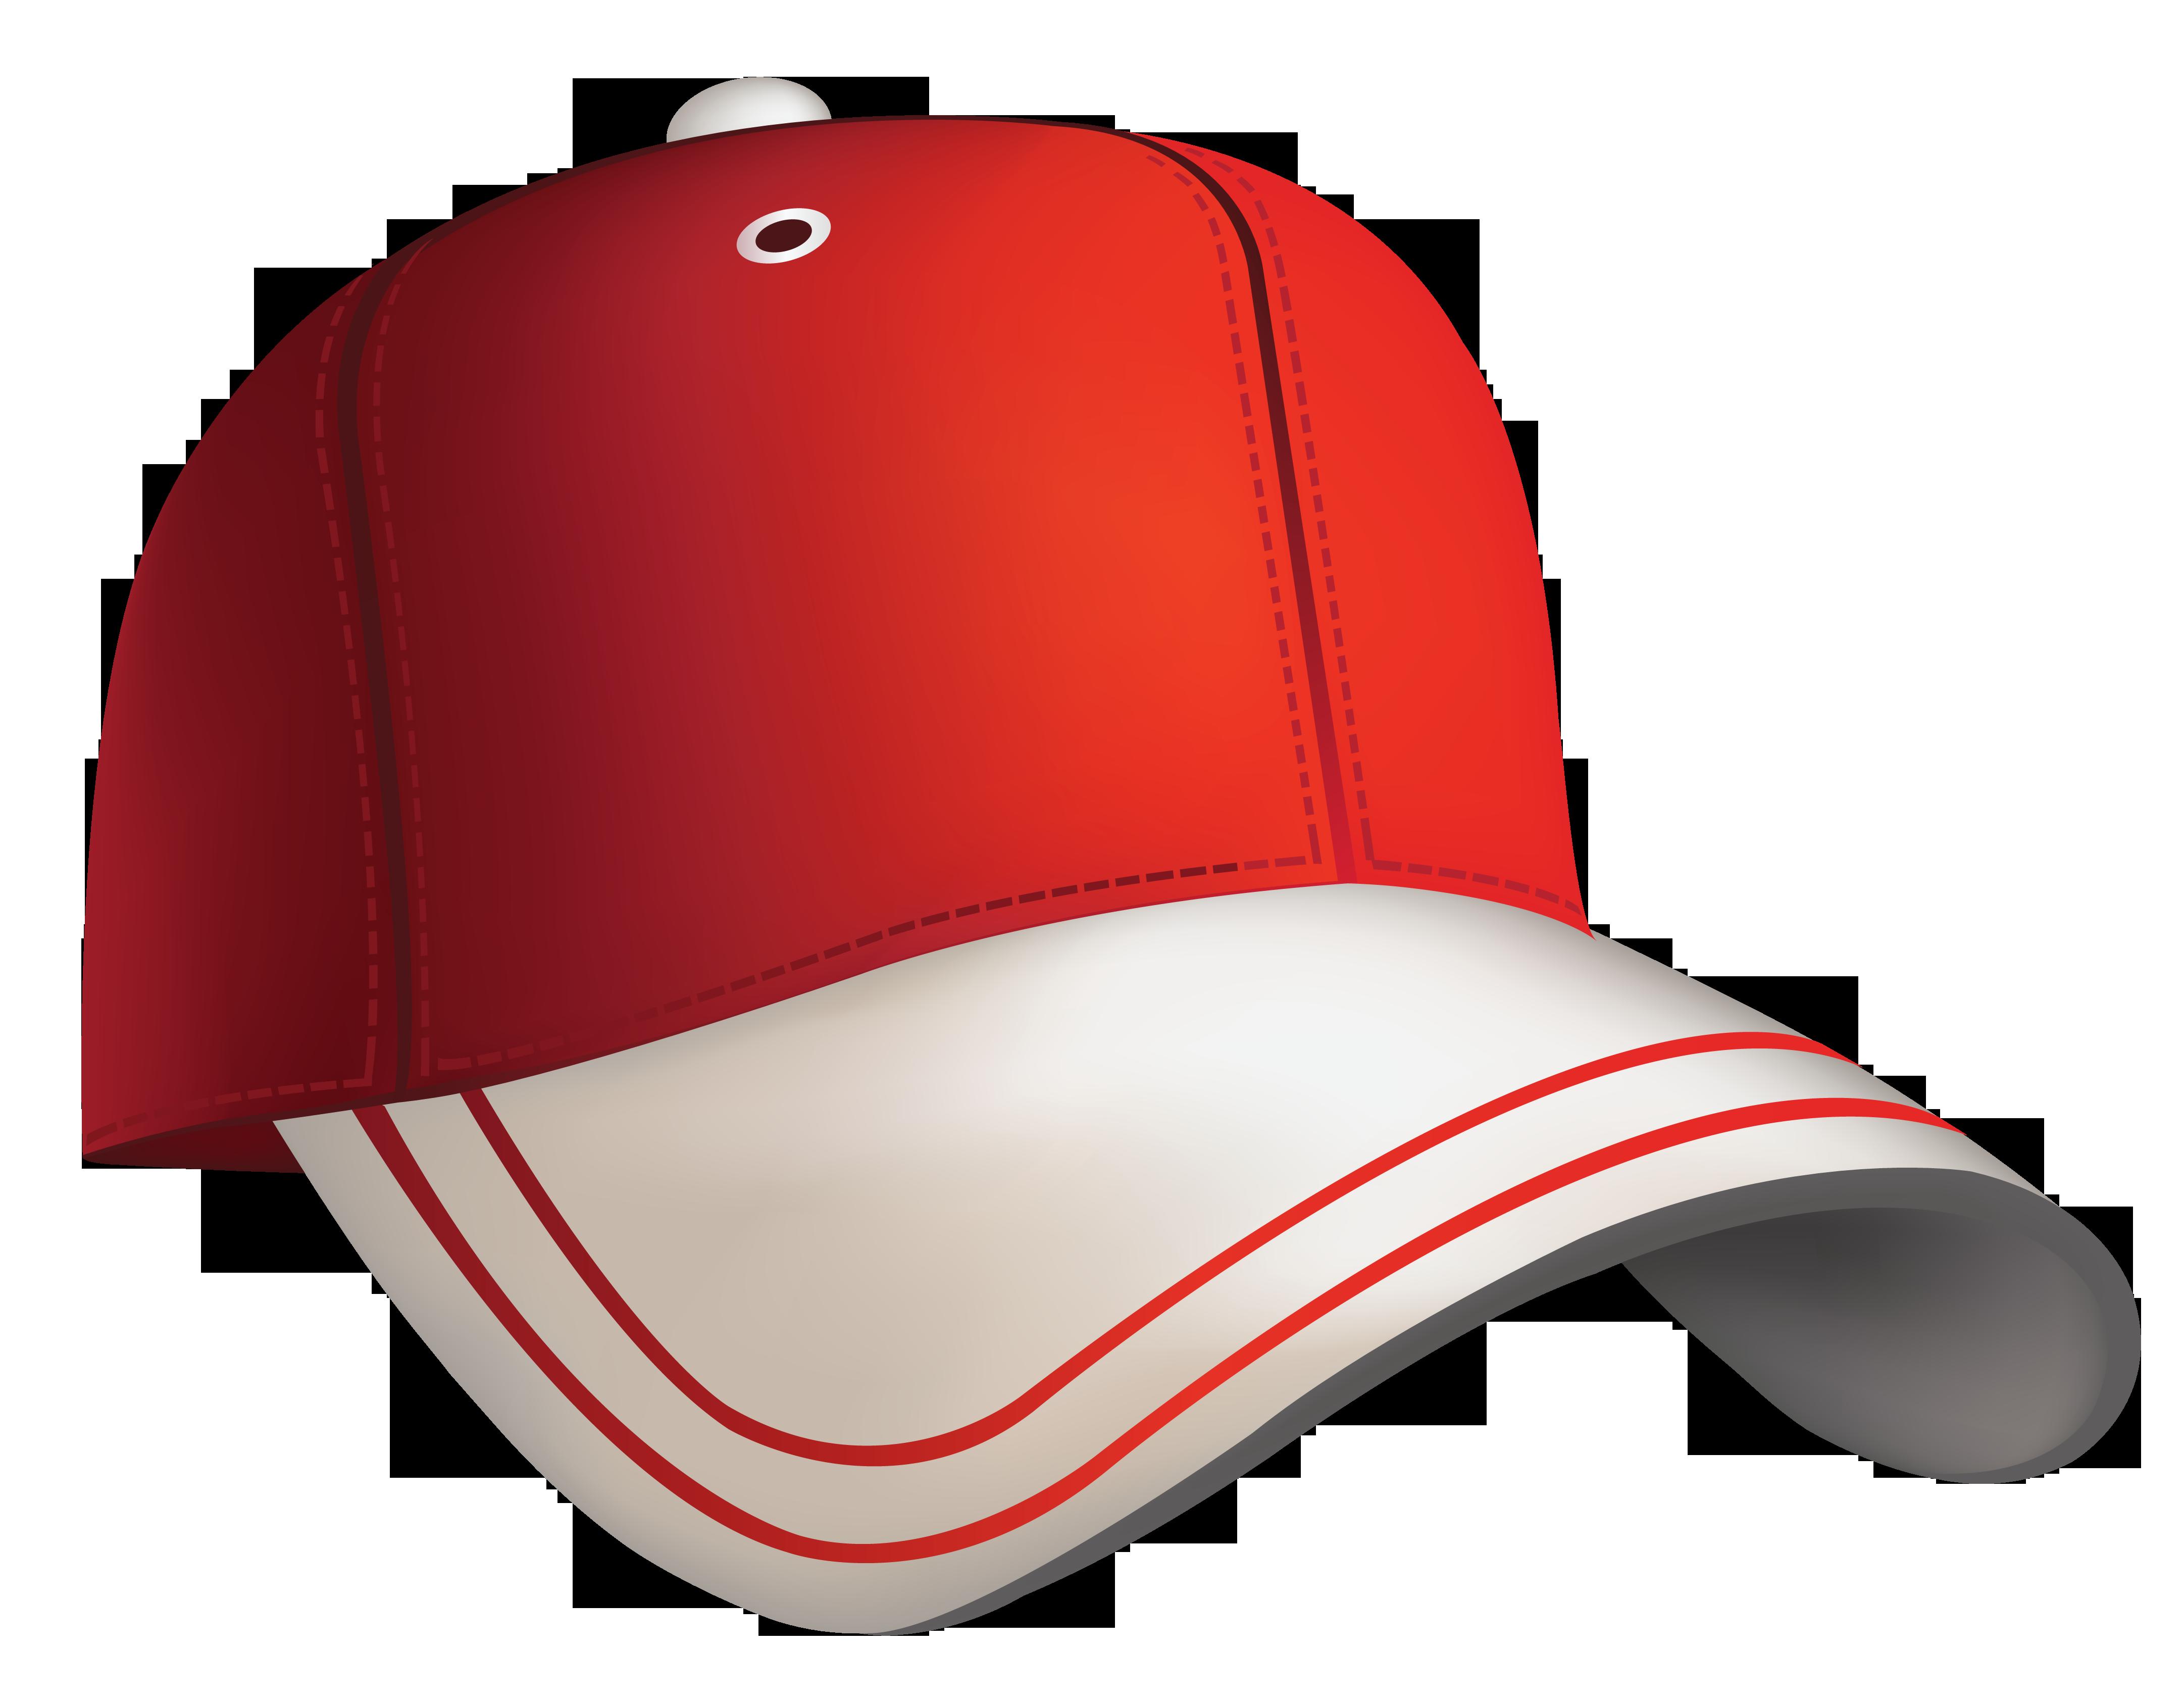 Baseball Cap Clipart - Clipart Kid